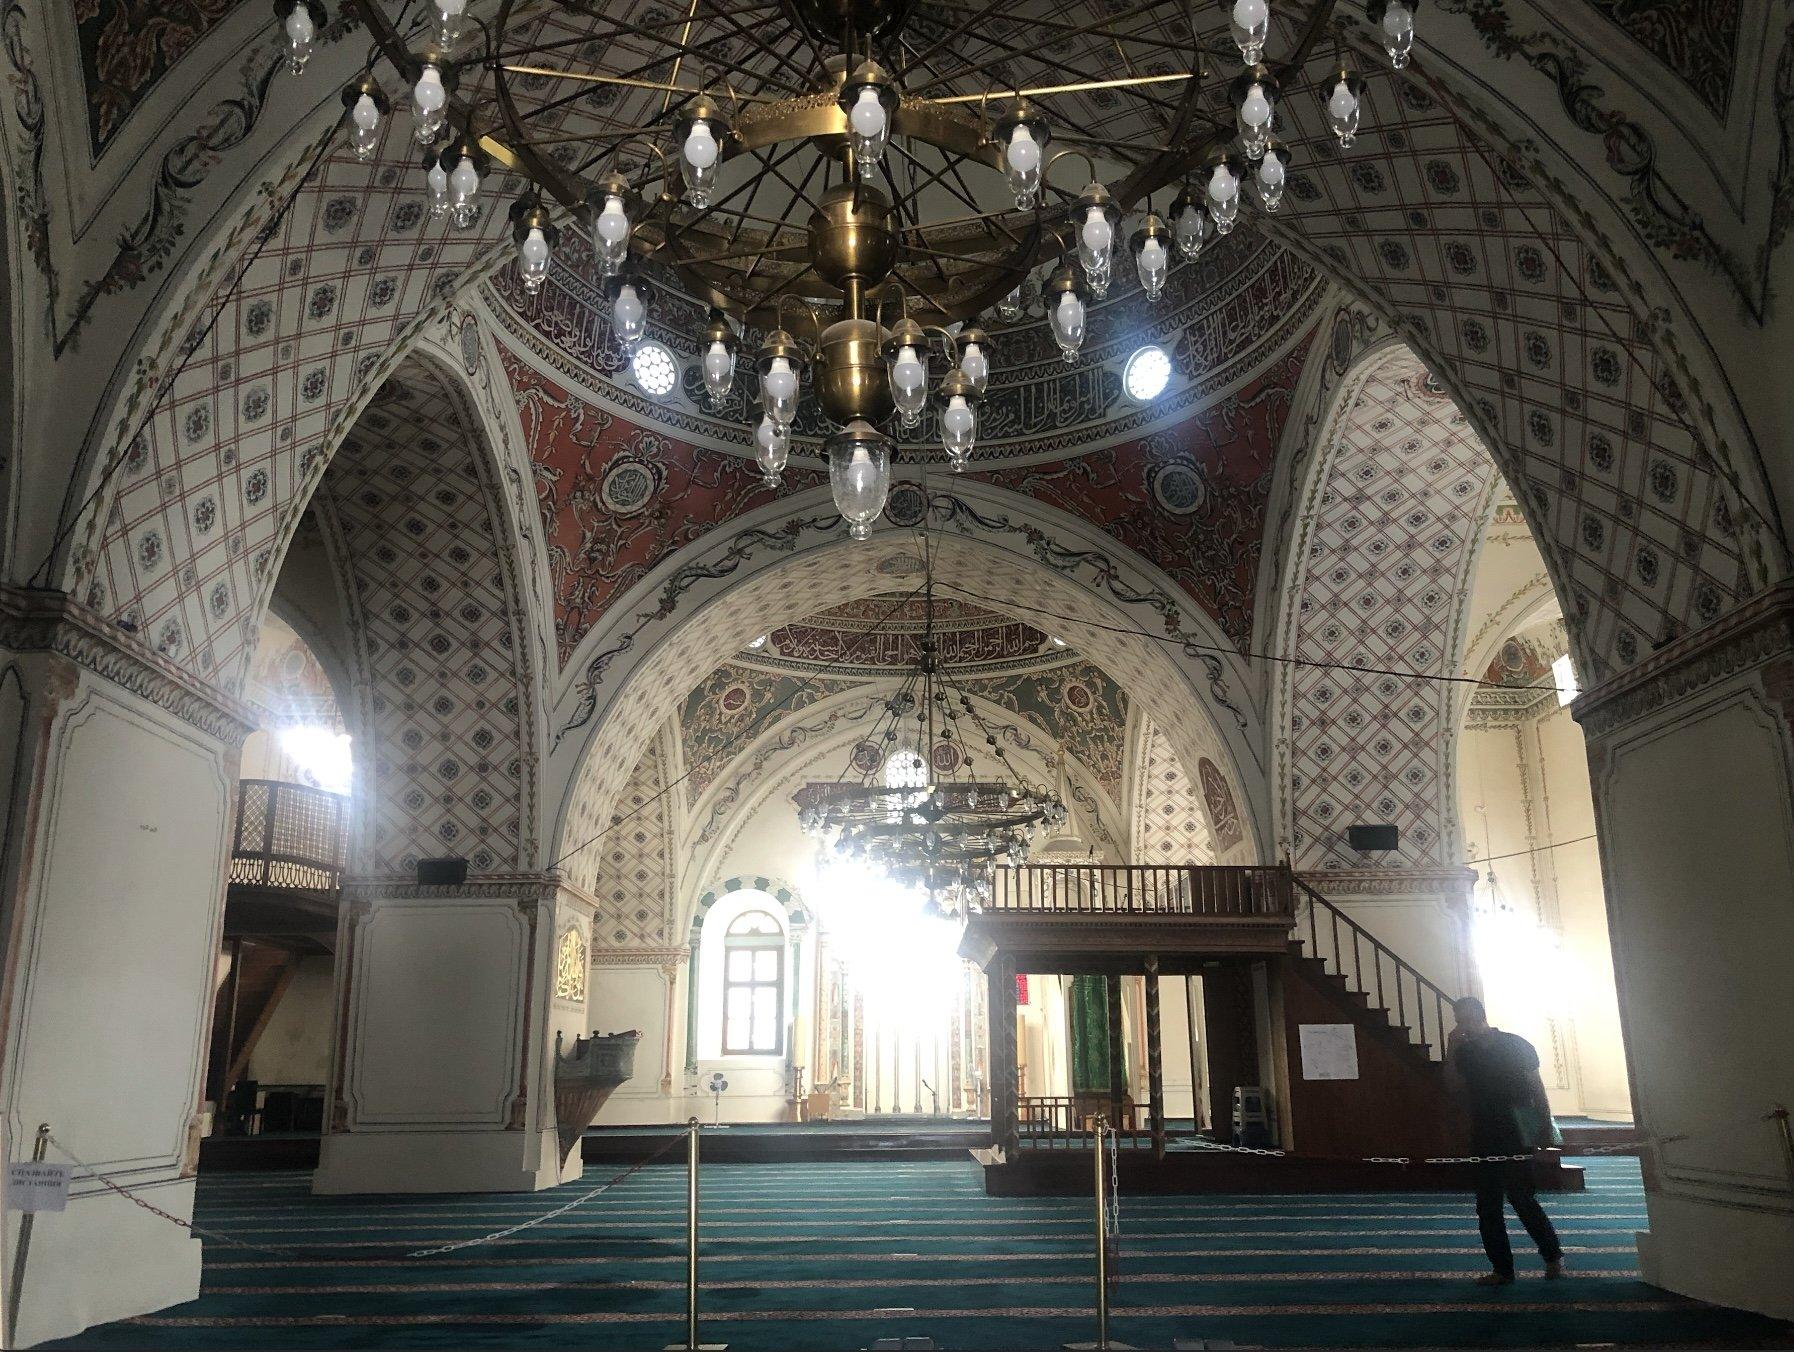 The interior of the Dzhumaya Mosque in Filibe, Bulgaria.